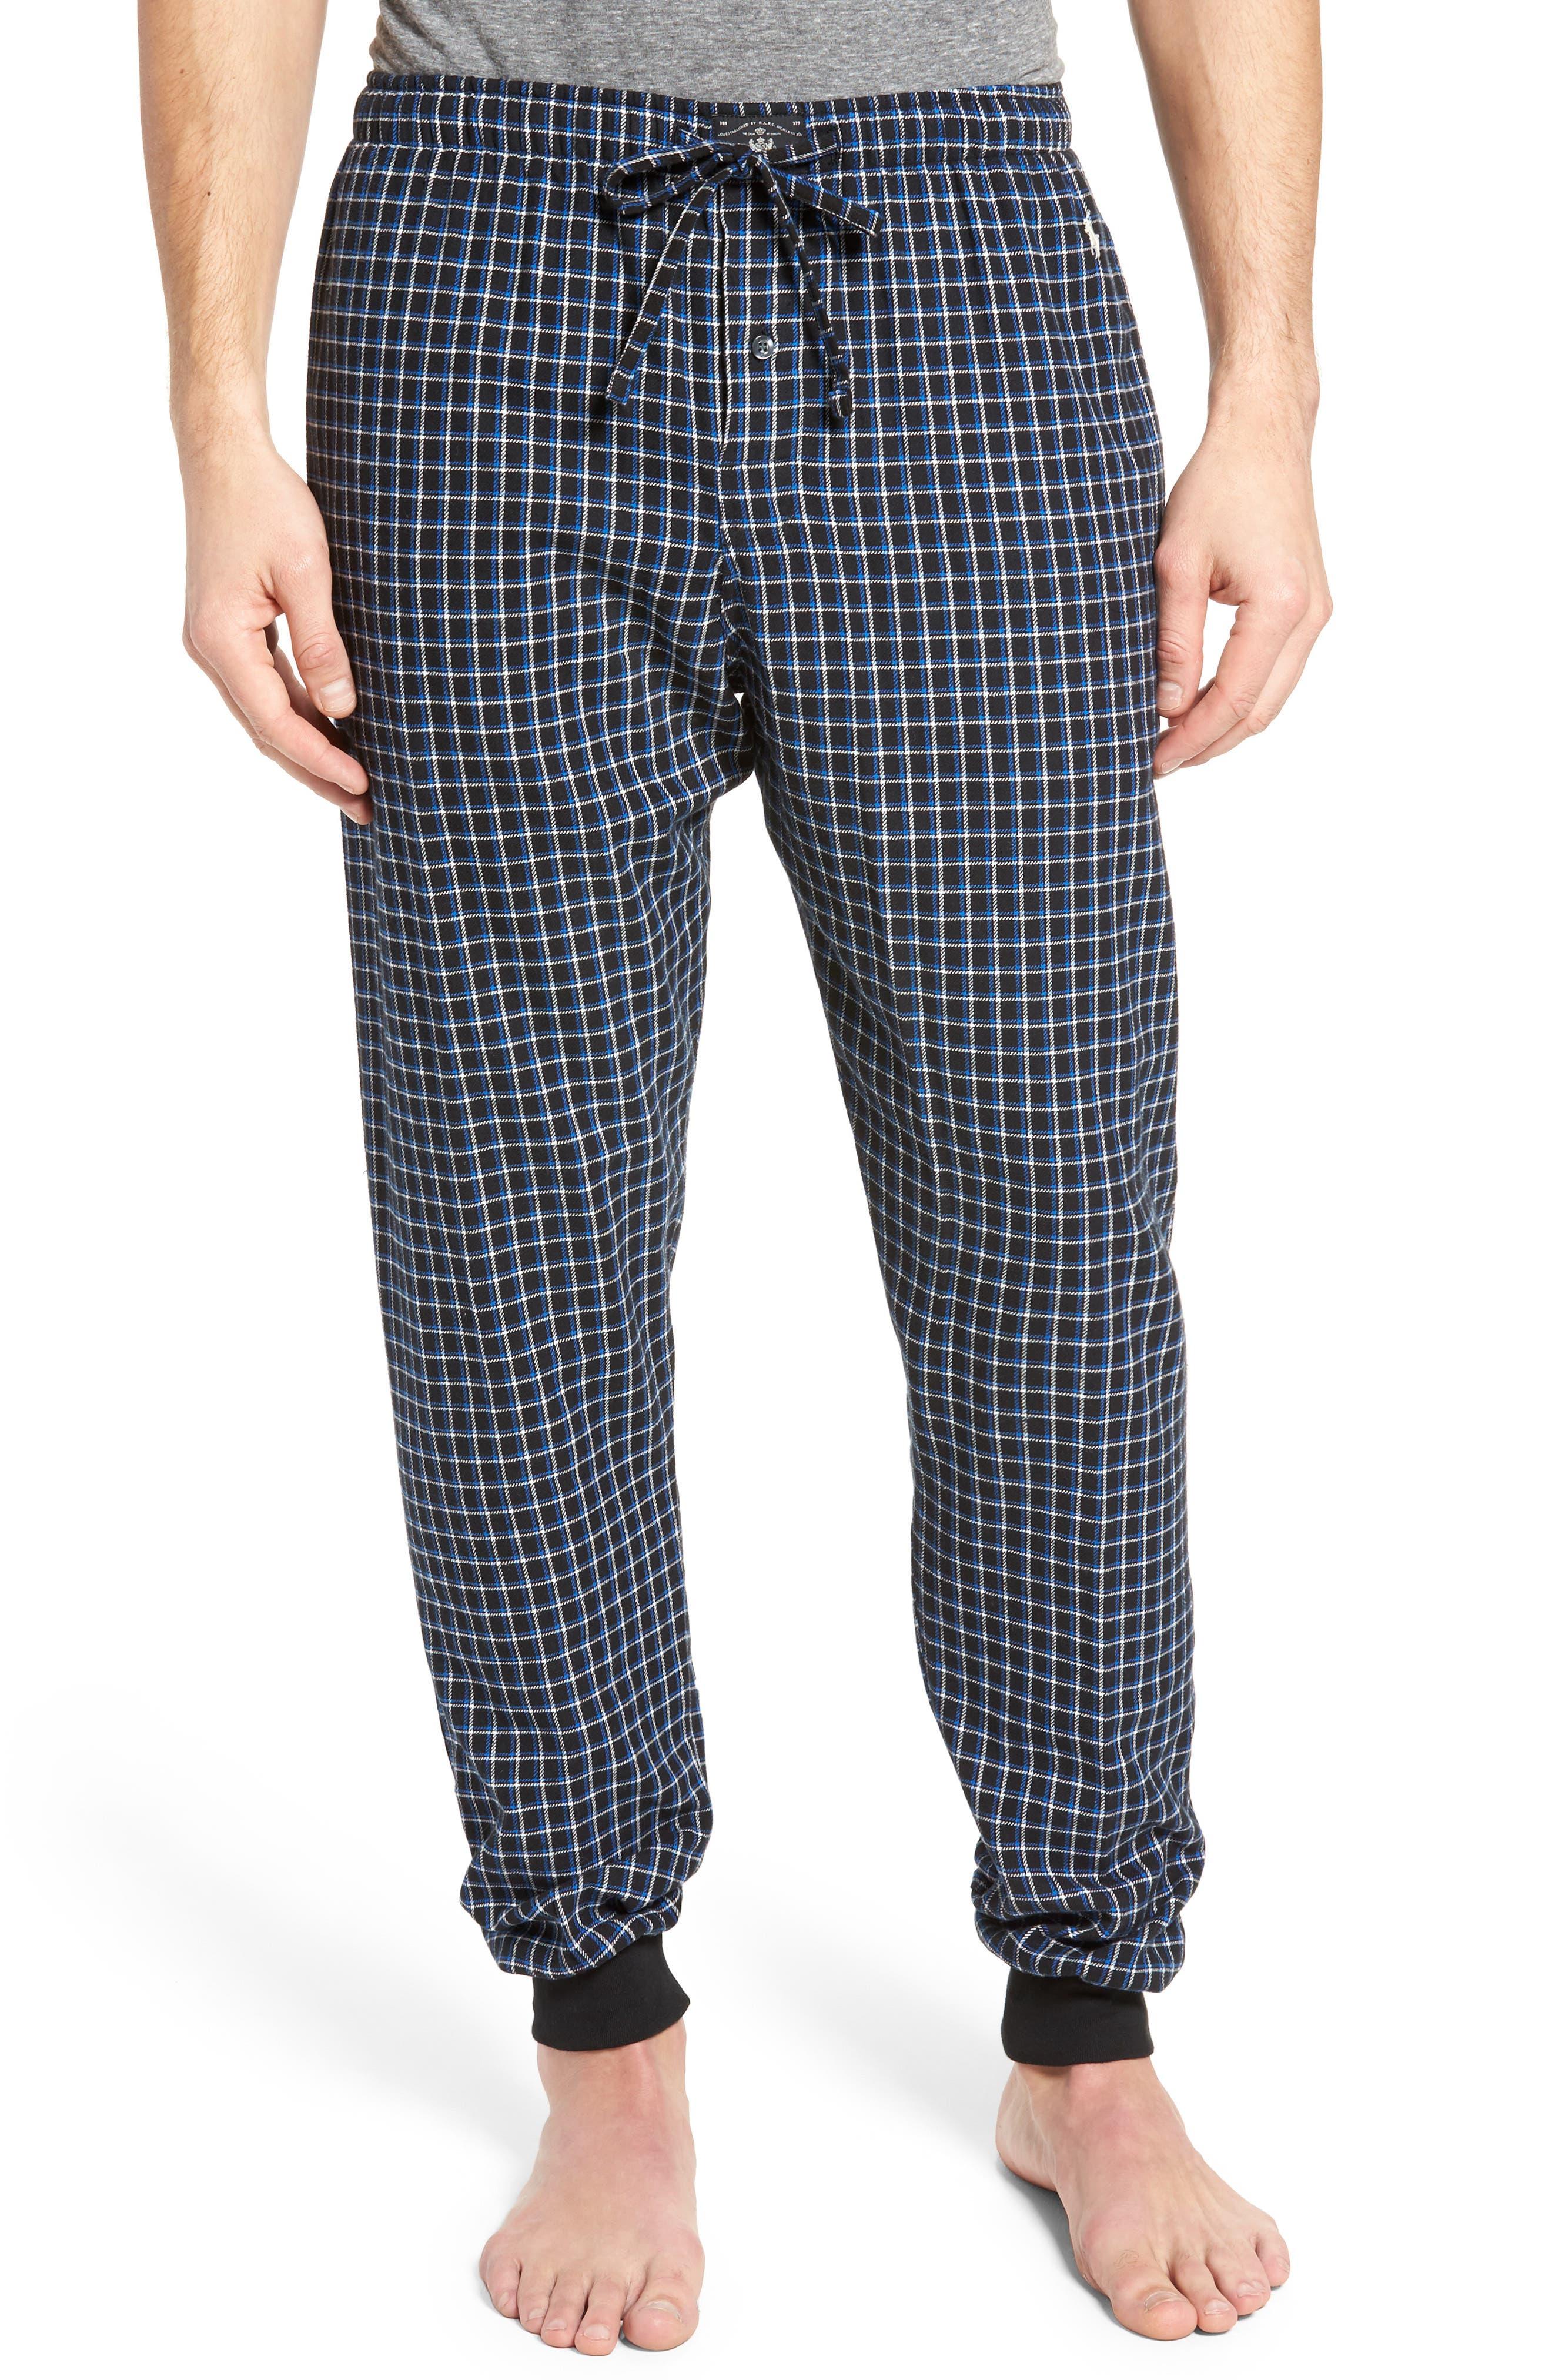 Flannel Pajama Jogger Pants,                         Main,                         color, Logan Plaid/ Crescent Cream